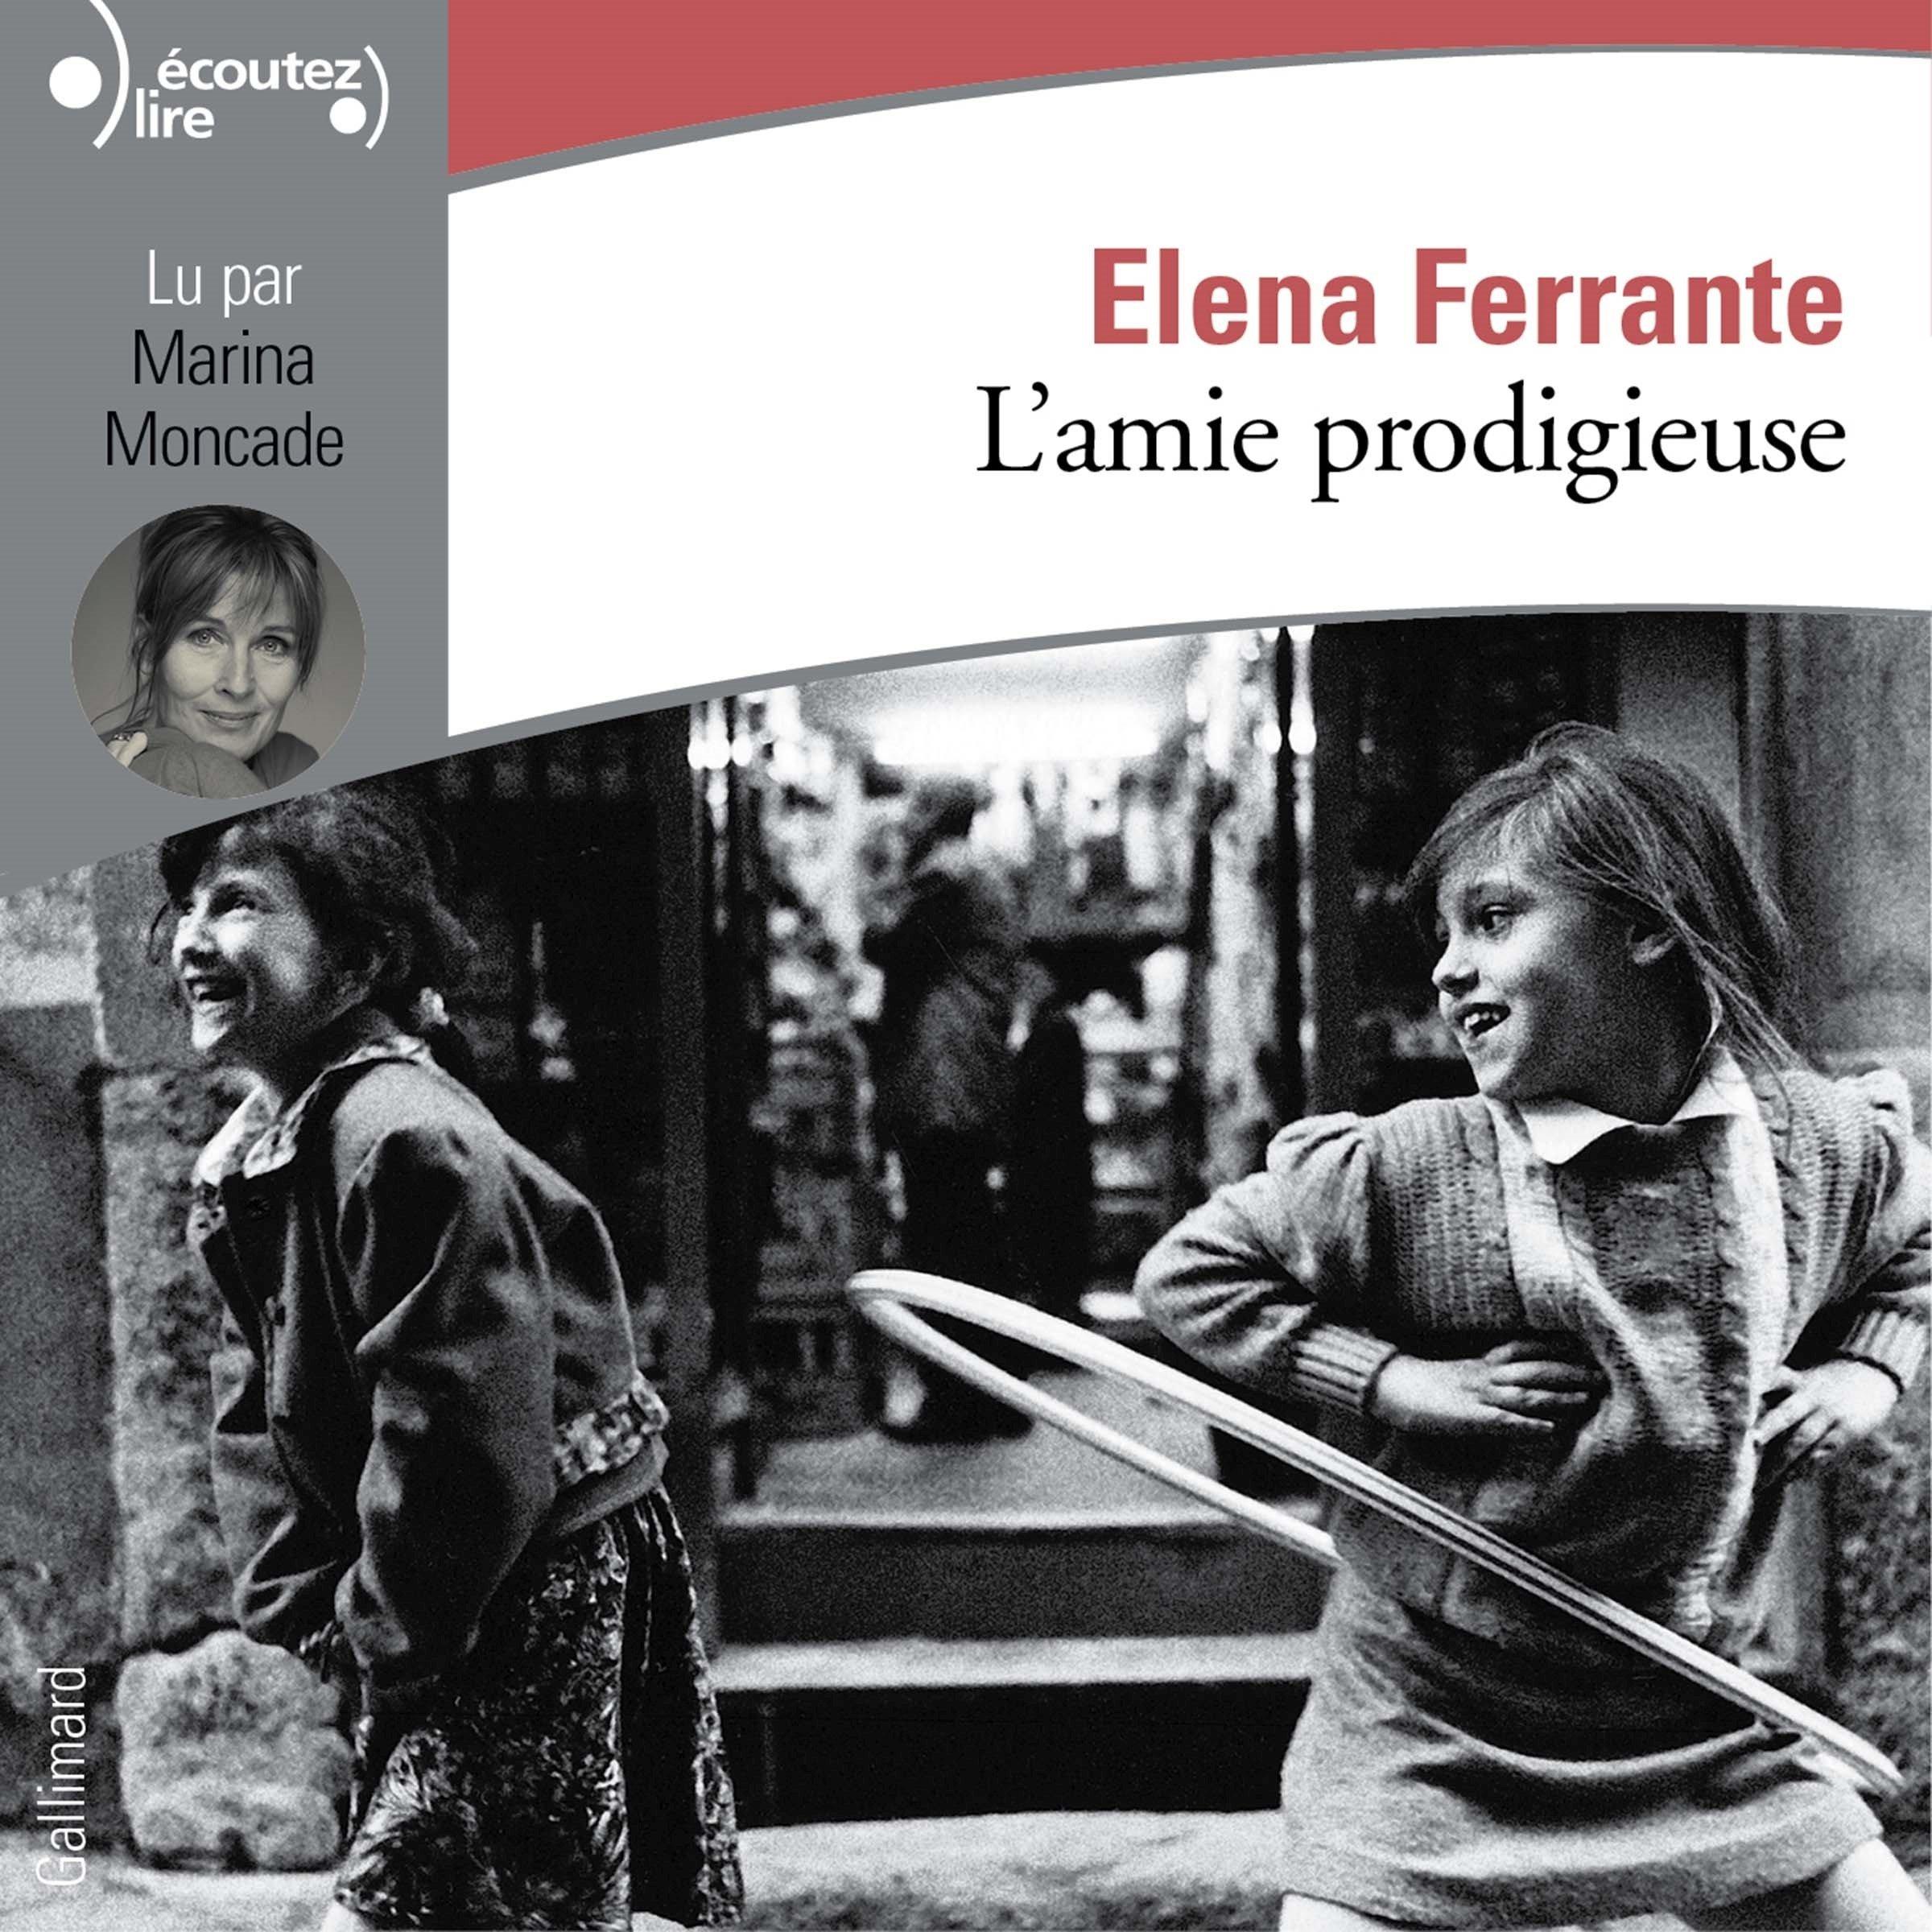 L'amie prodigieuse 1 de Élena Ferrante